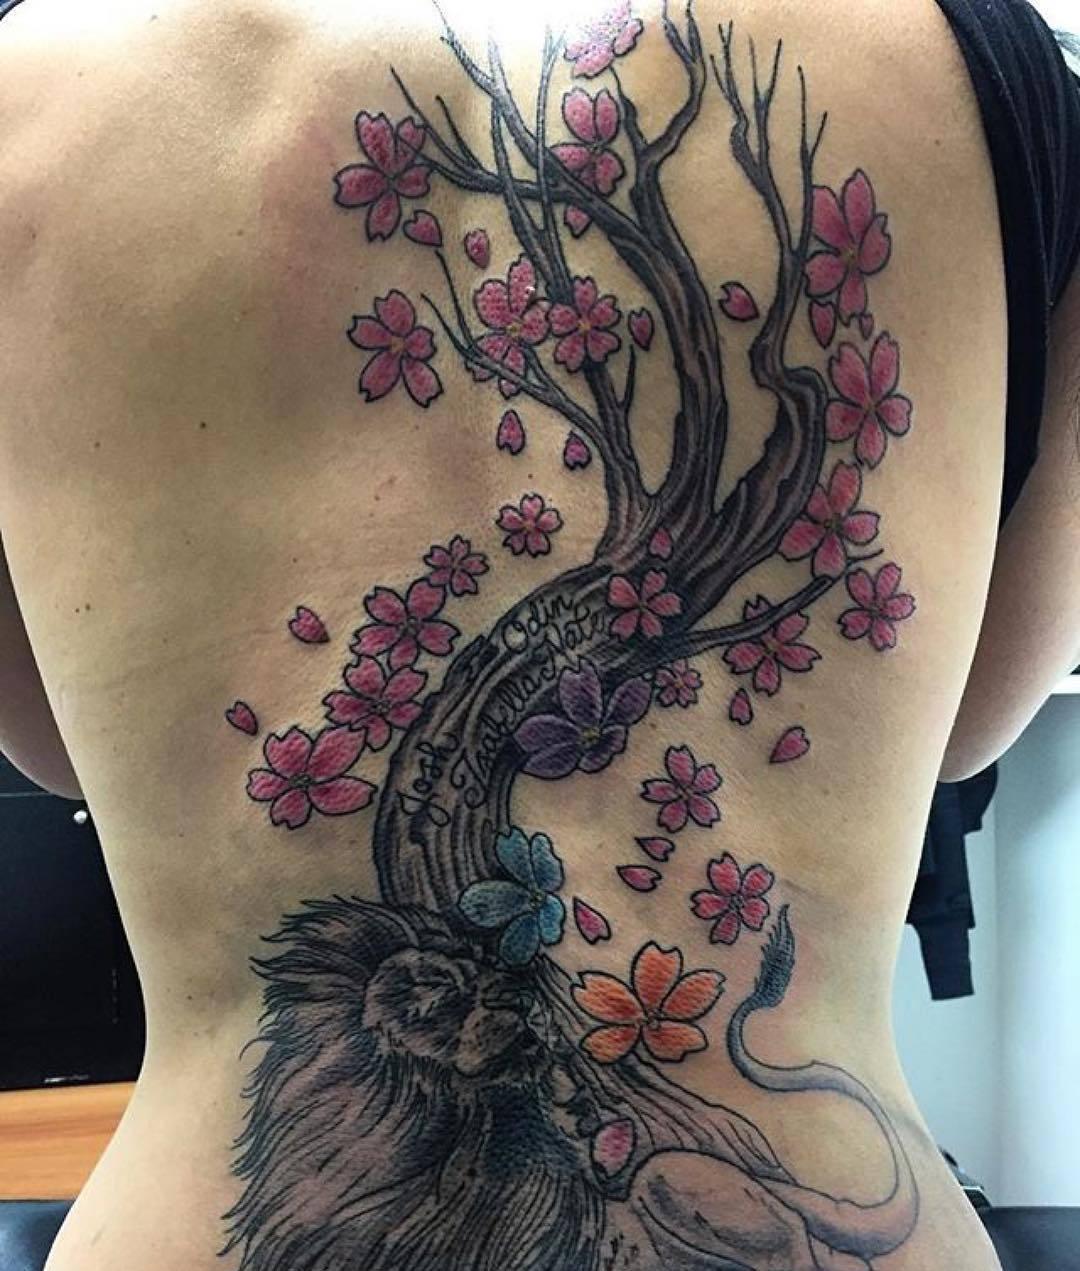 Tattoo Quotes Cherry Blossom: 75+ Best Japanese Cherry Blossom Tattoo